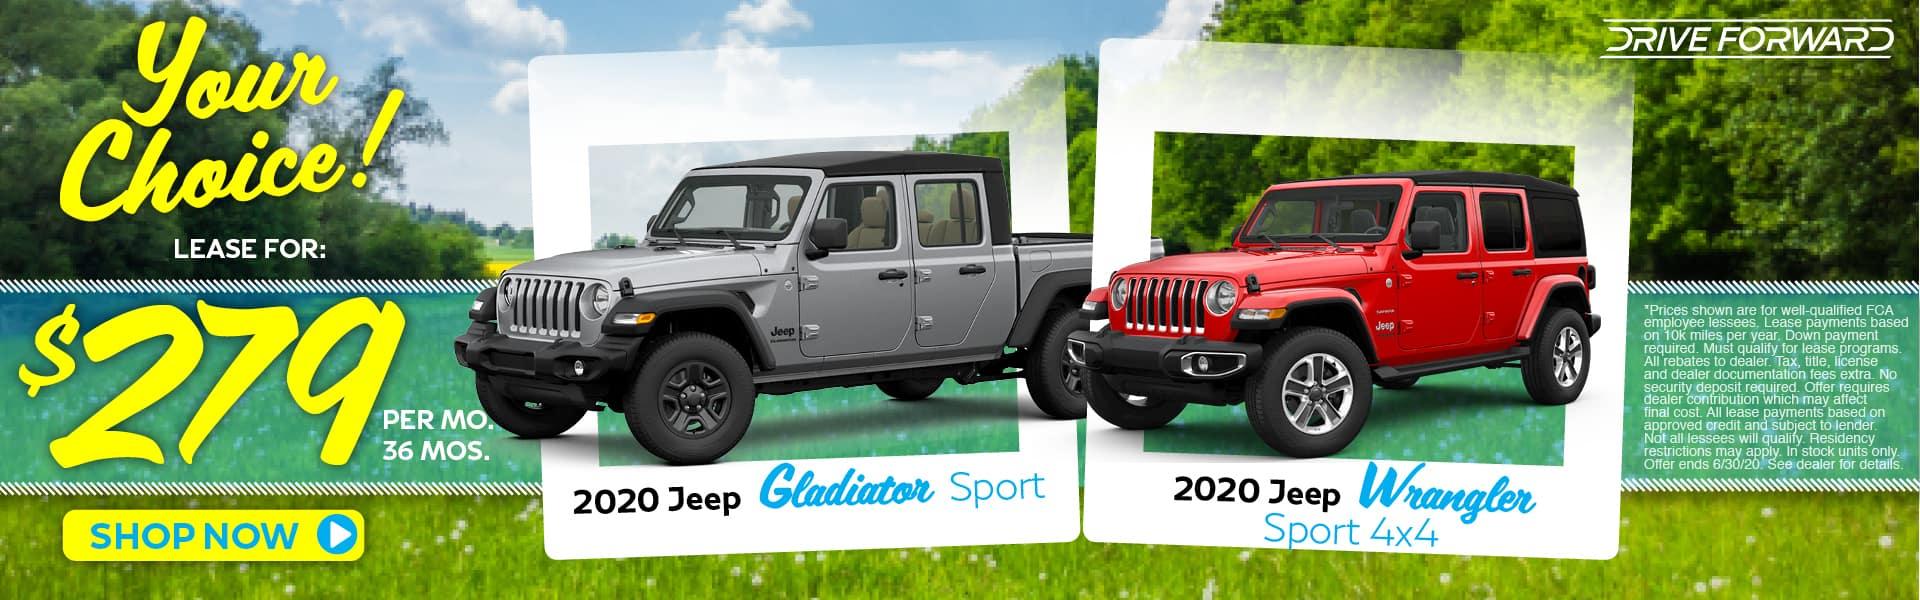 2020 Jeep Gladiator and Wrangler Lease Specials in Pinckney, MI